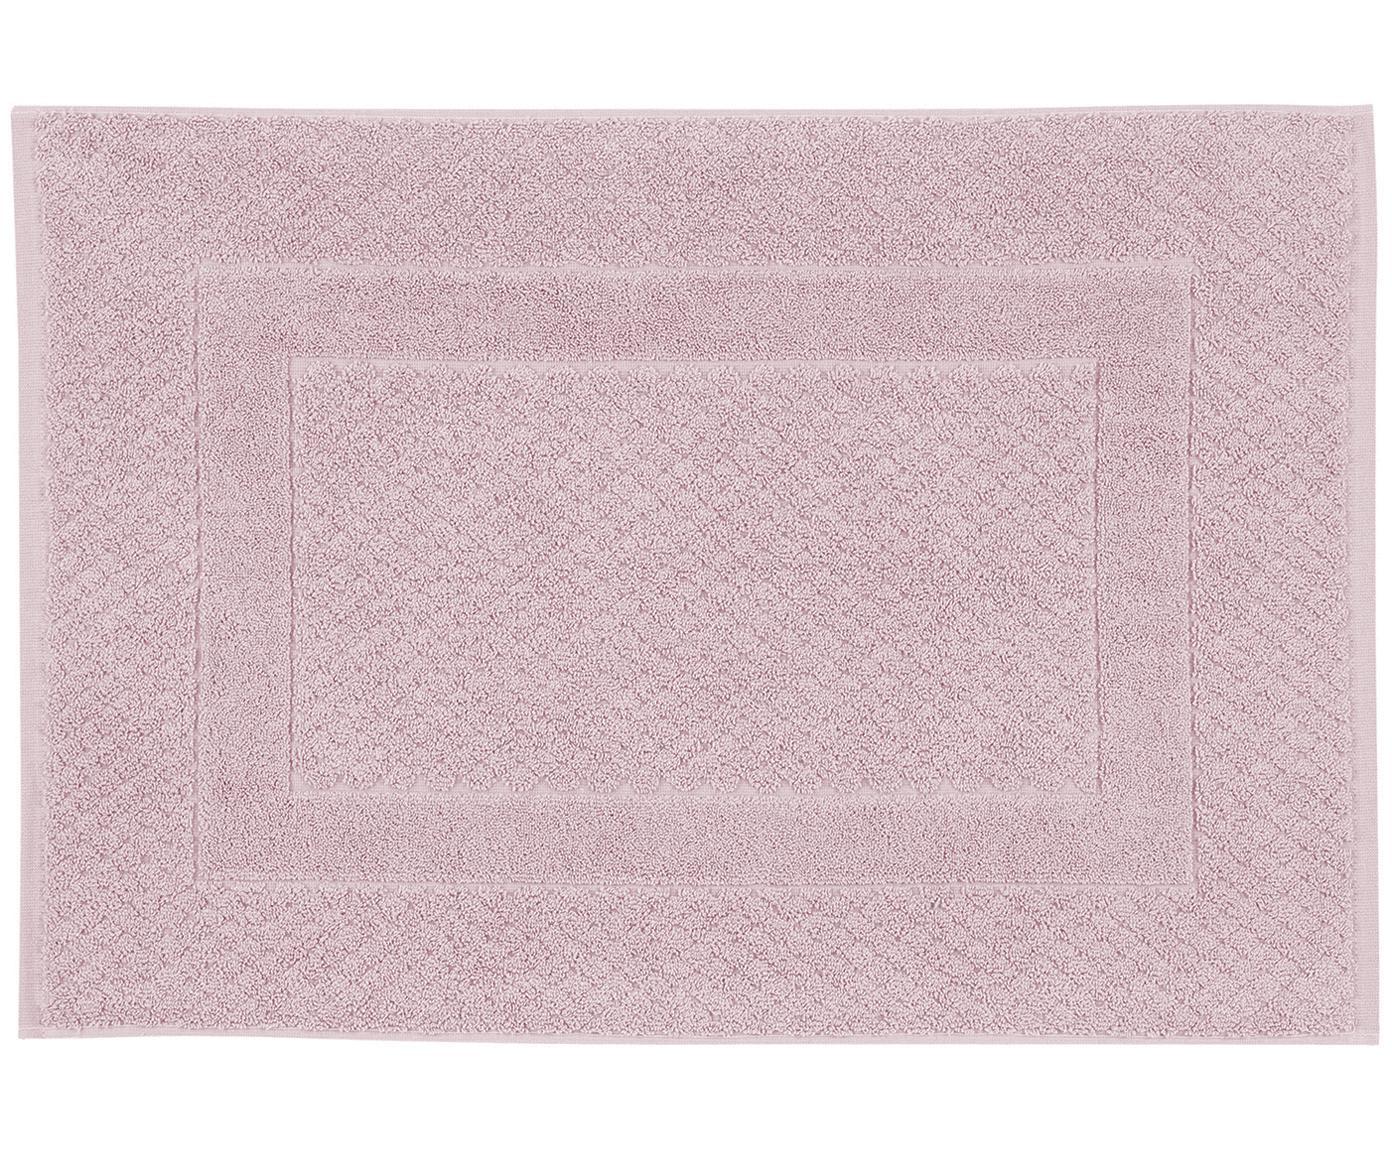 Alfombrilla de baño Katharina, 100%algodón, gramaje superior, 900g/m², Rosa palo, An 50 x L 70 cm